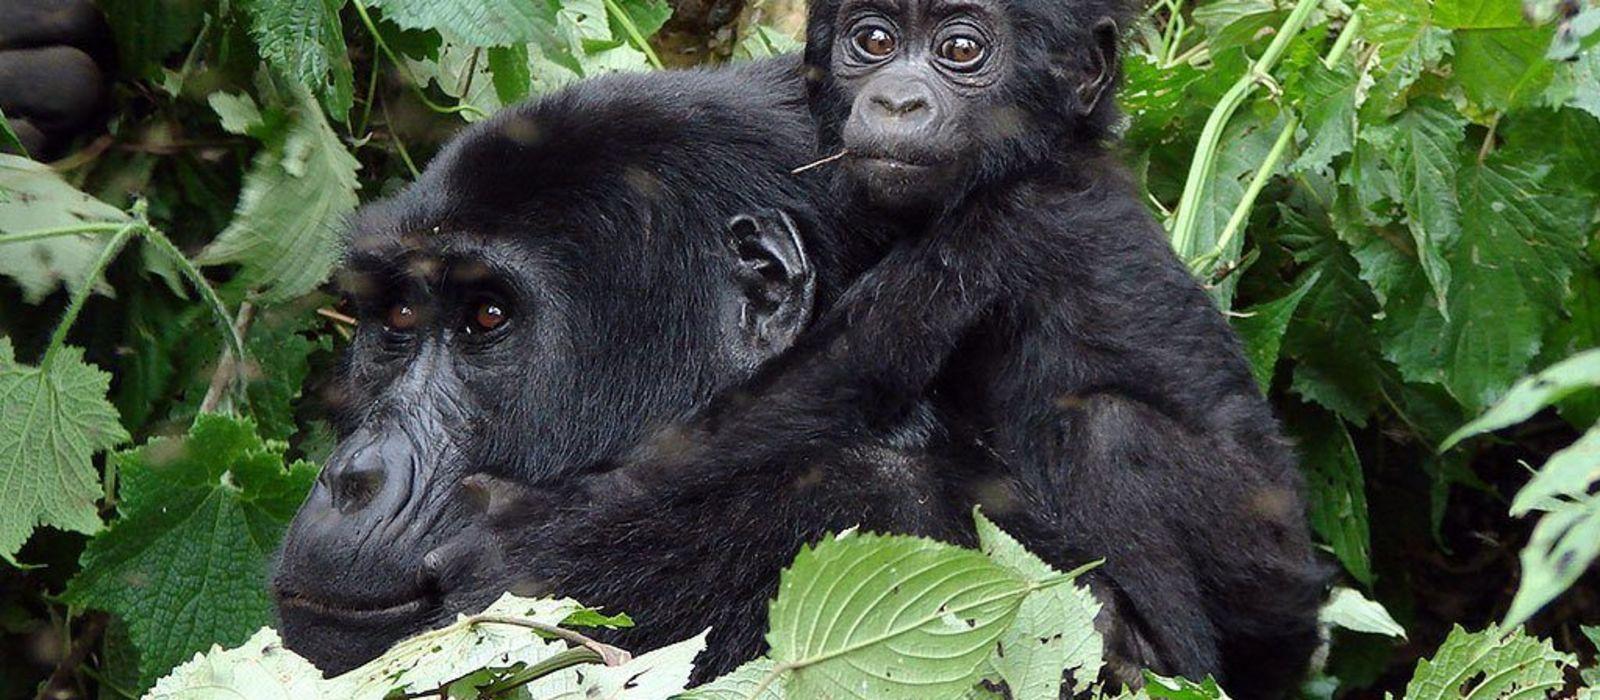 Kenia und Ruanda: Safari und Gorilla-Trekking Urlaub 1